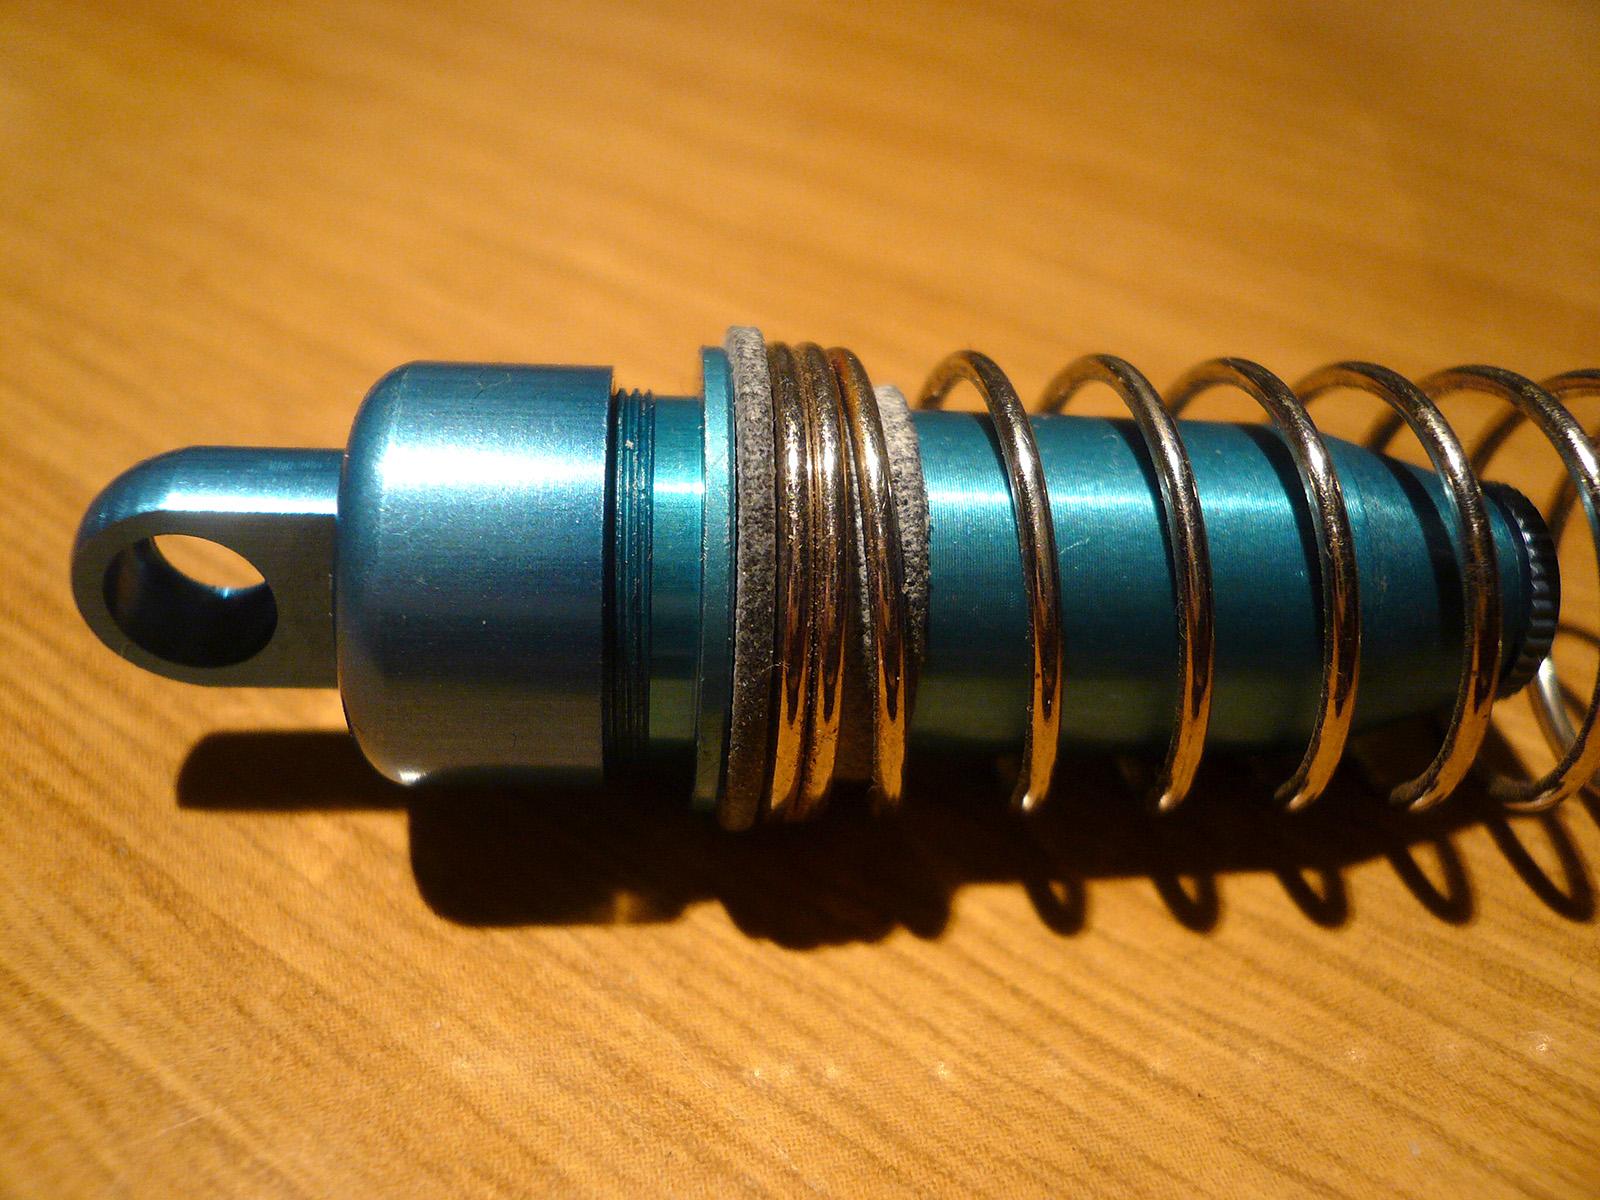 tamiya wrenchdog dyna storm sleeved damper spring spacer n5 n6